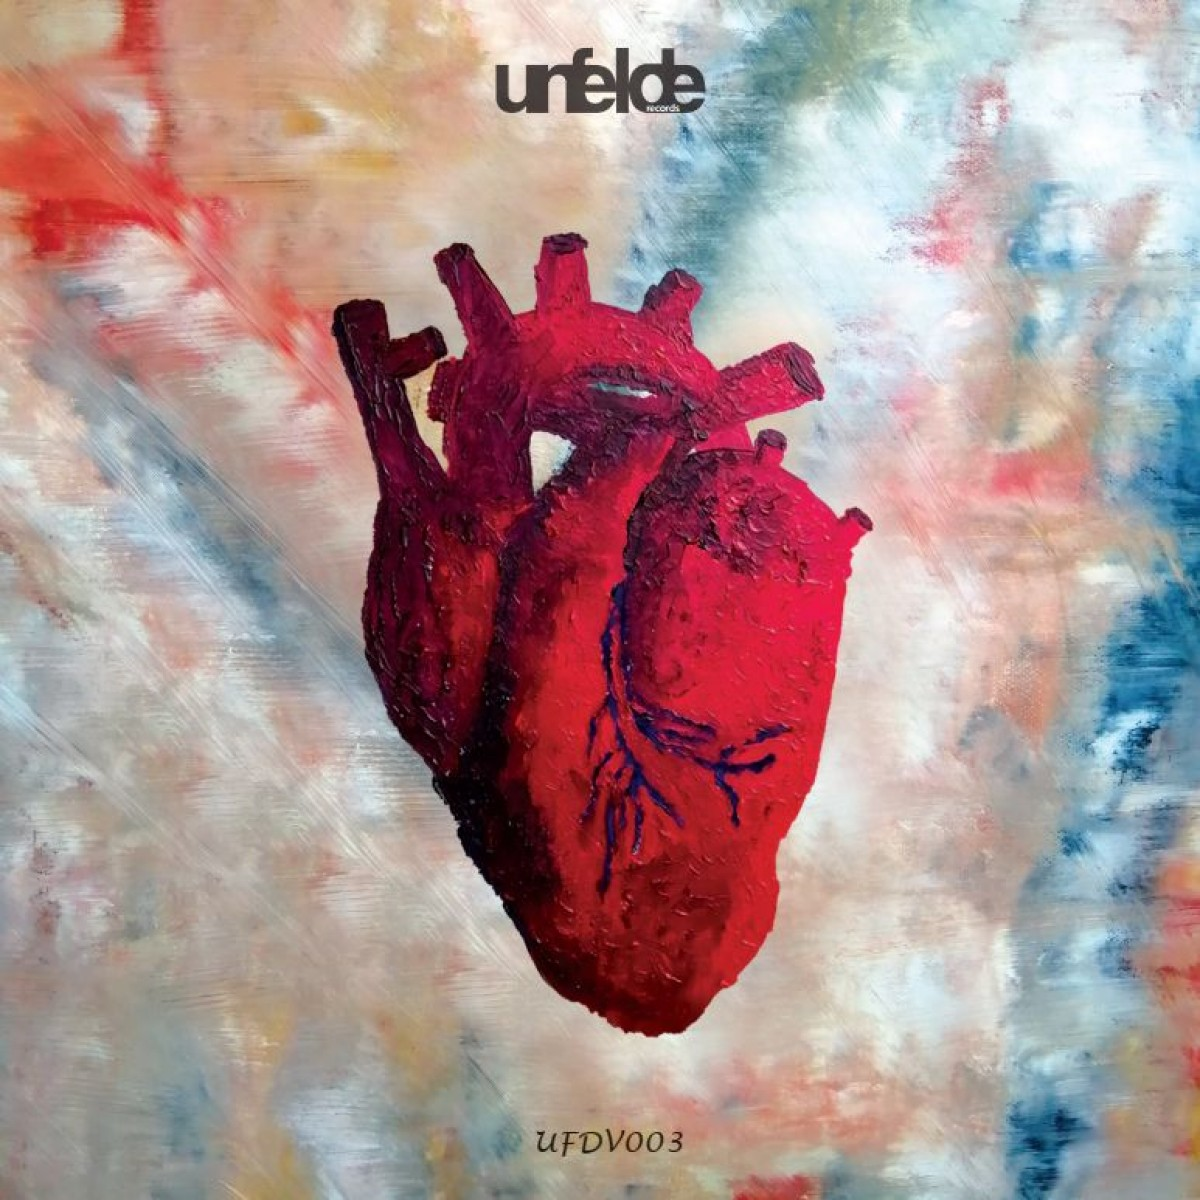 Robert David - UFDV003 [Unfelde Records] 01